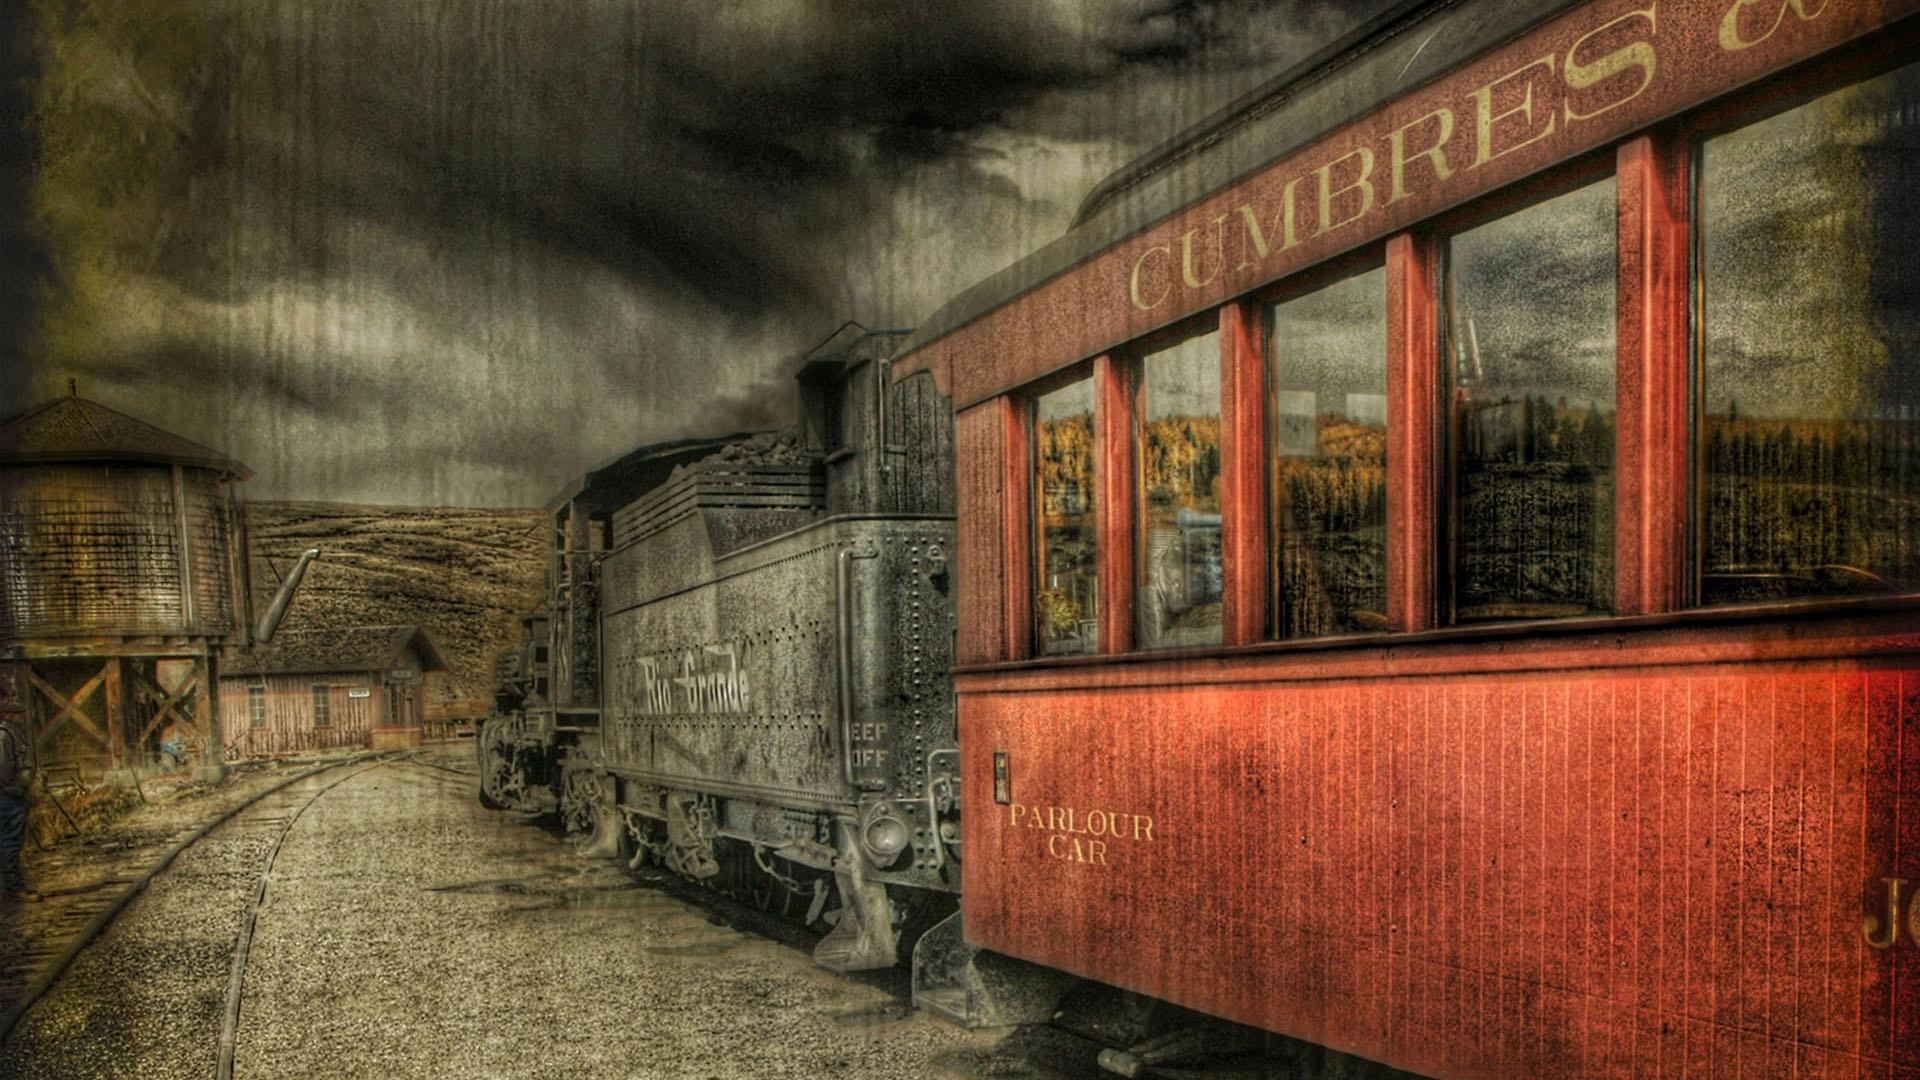 Vintage train wallpaper 5054 1920x1080